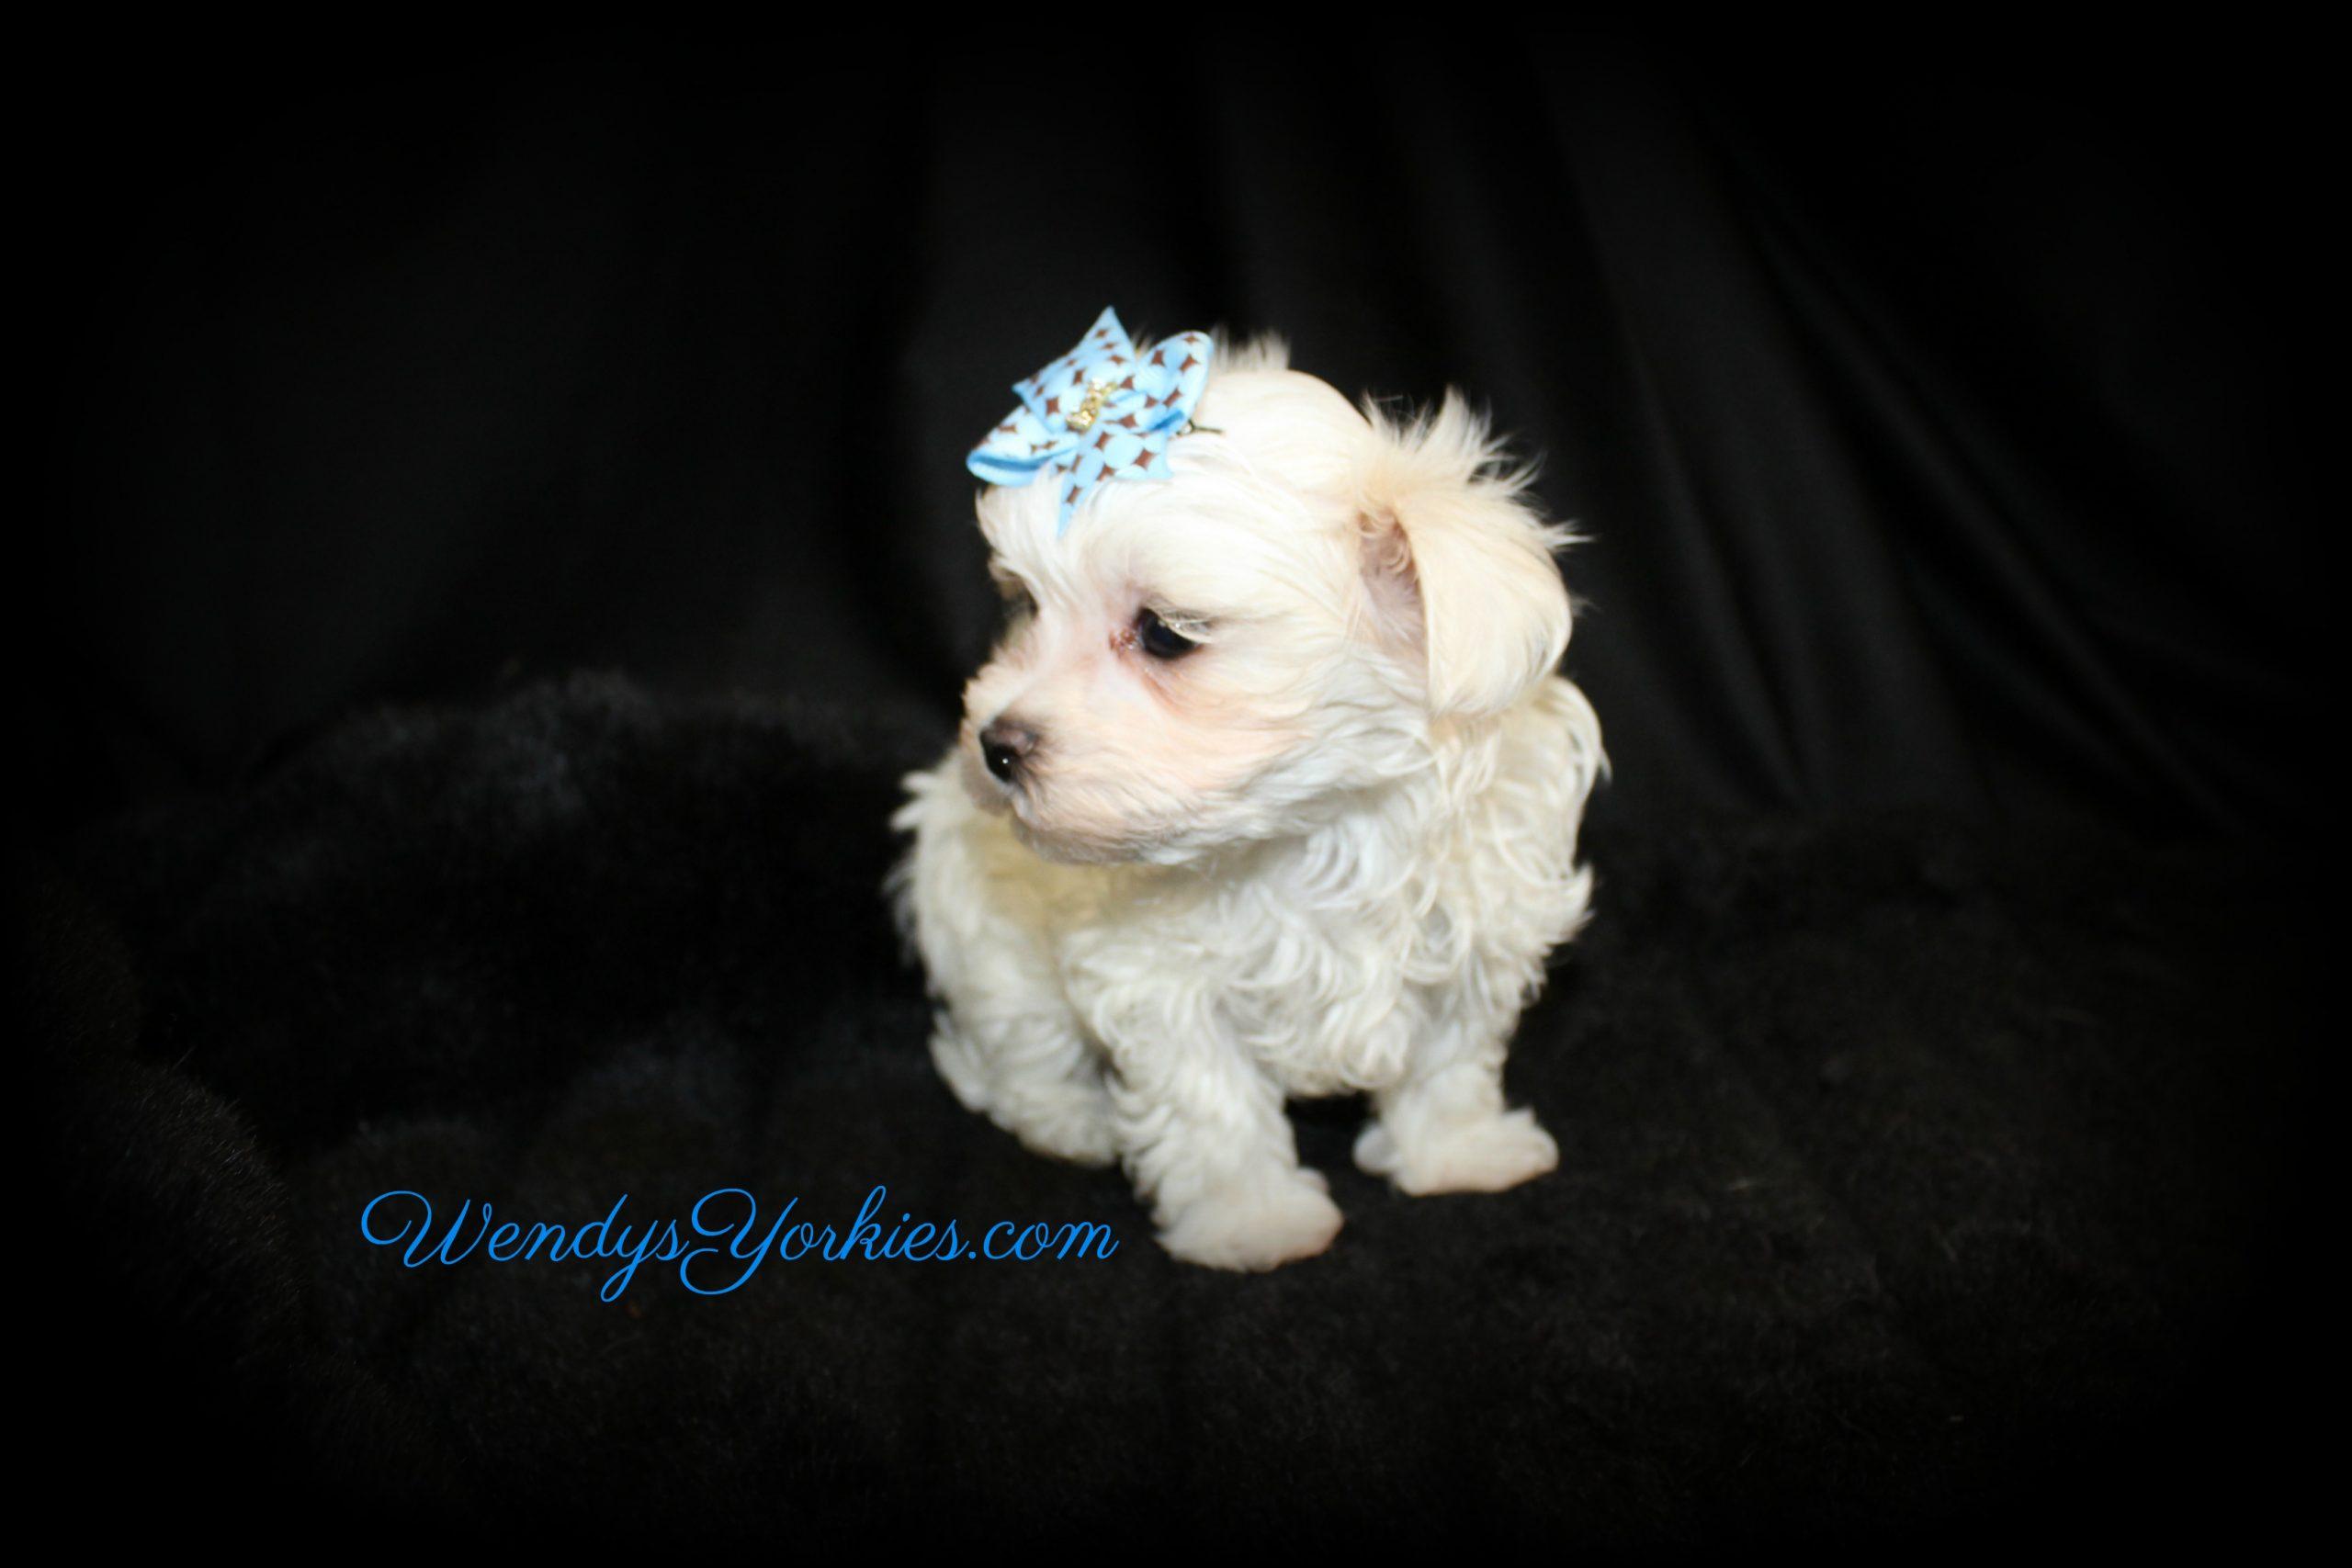 Male Maltese puppy for sale, Zeus, WendysYorkies.com